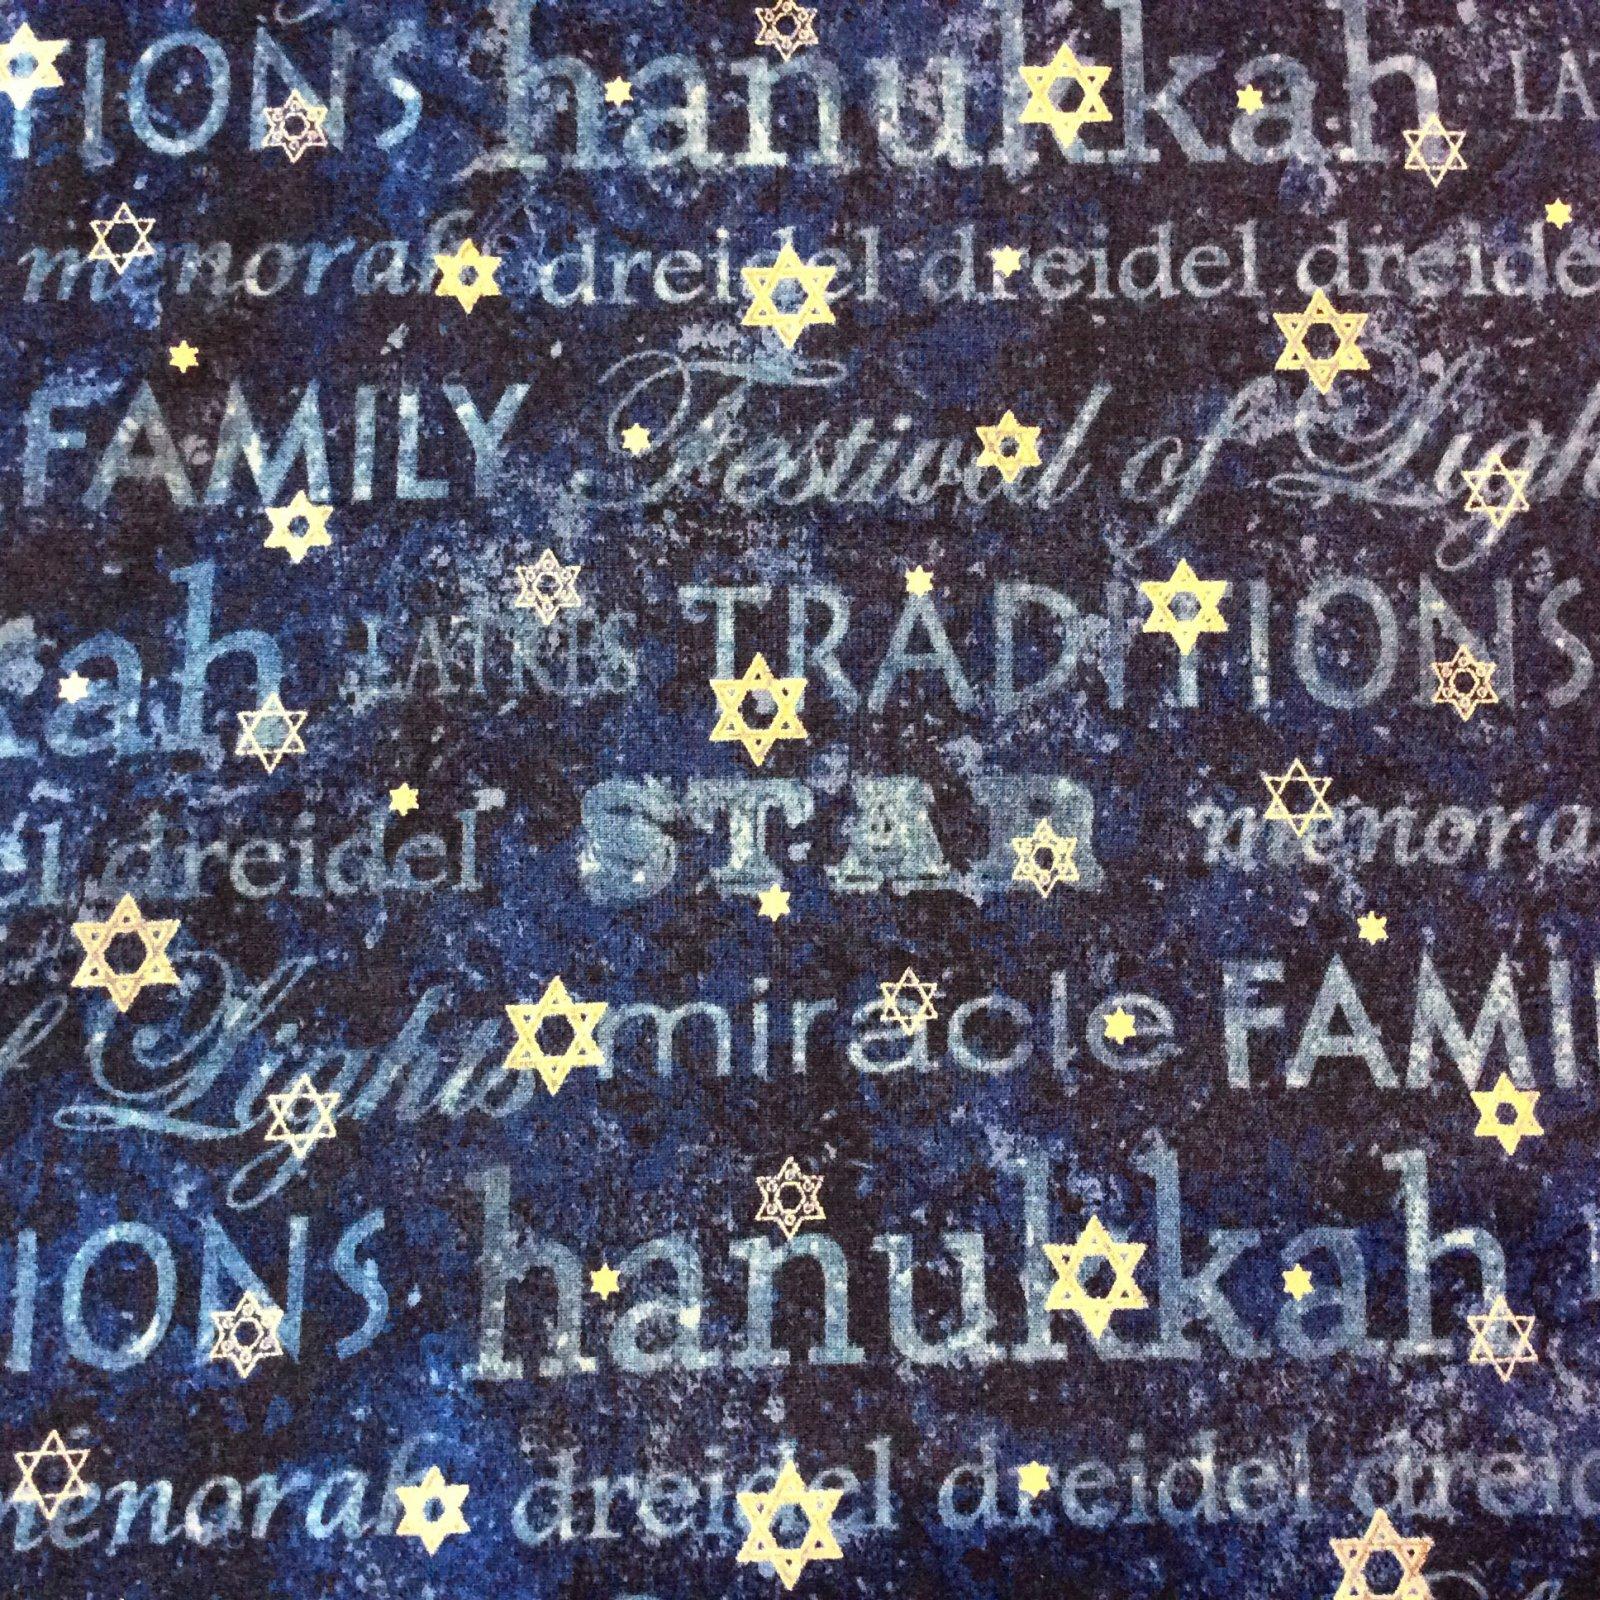 NC07 Hanukkah Star of David Winter Holiday Menorah Religious ... : religious quilting fabric - Adamdwight.com